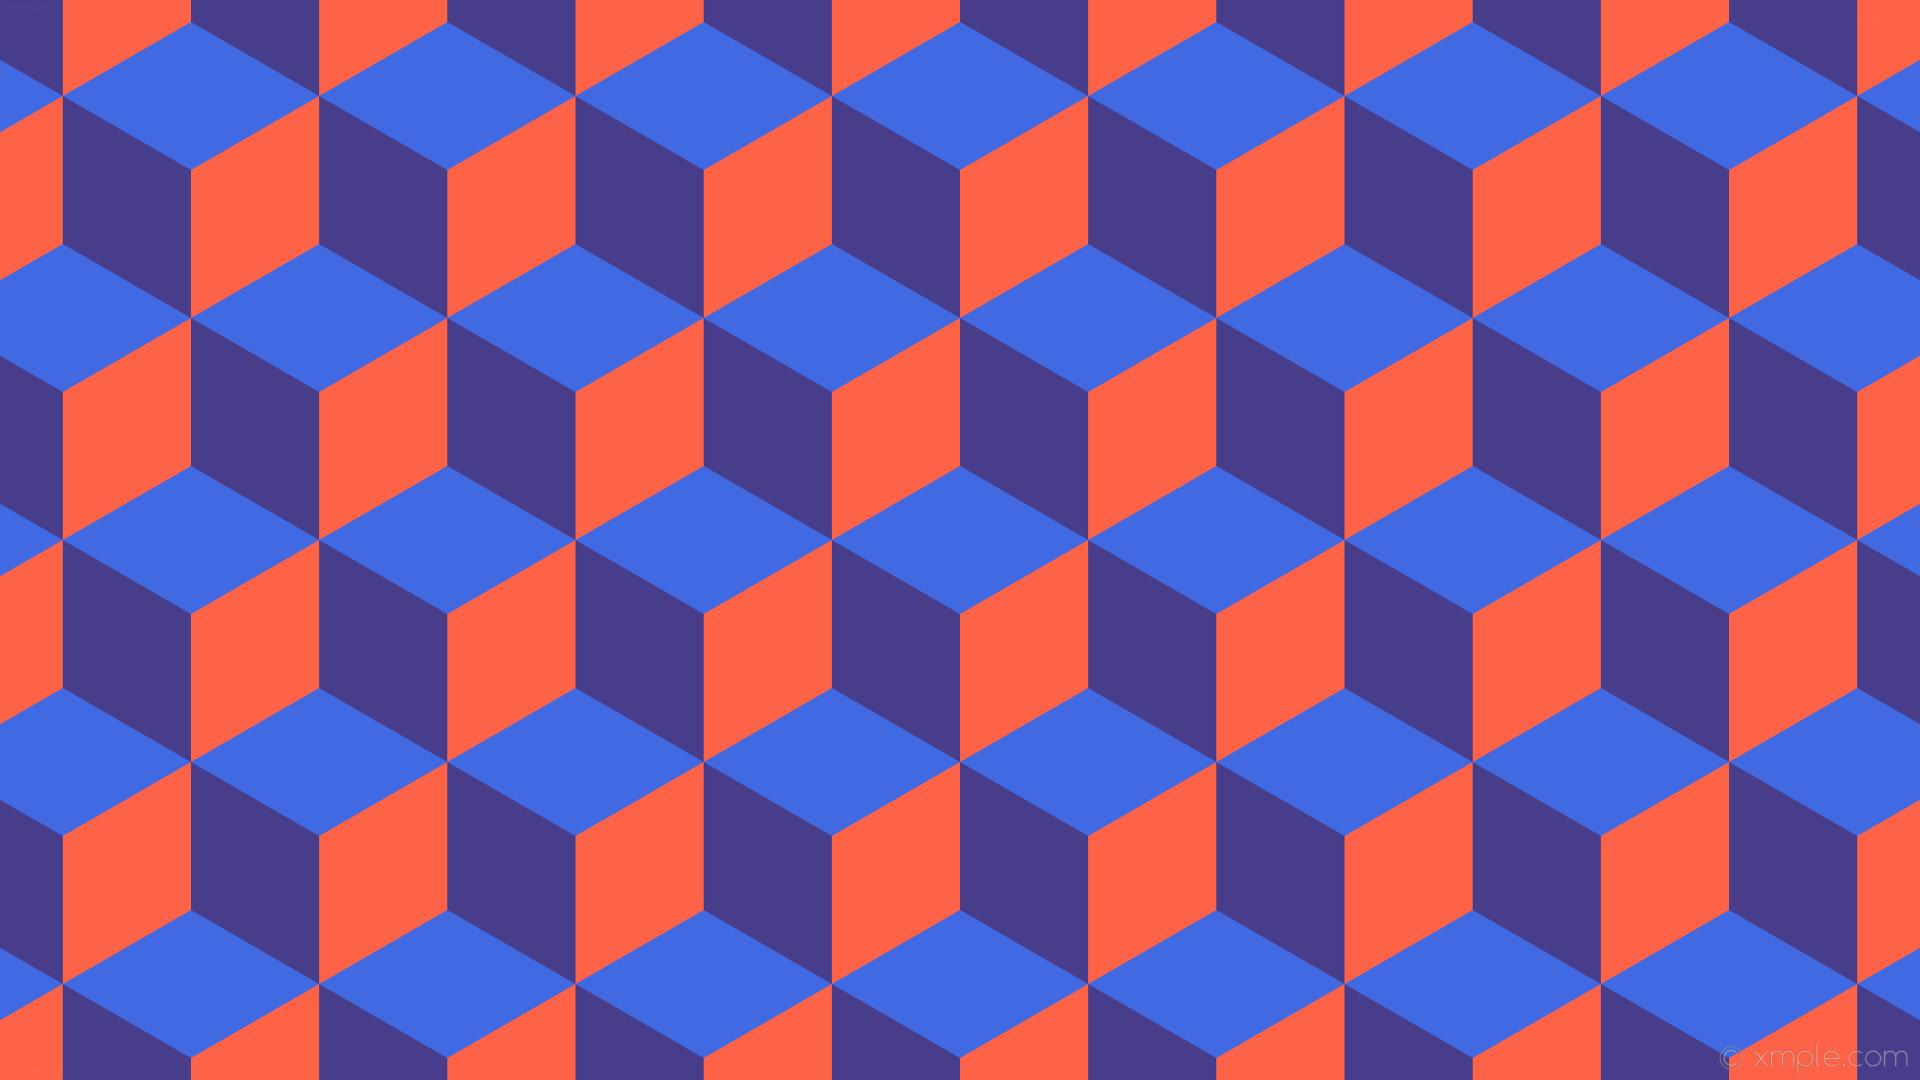 wallpaper 3d cubes blue orange purple royal blue dark slate blue tomato  #4169e1 #483d8b